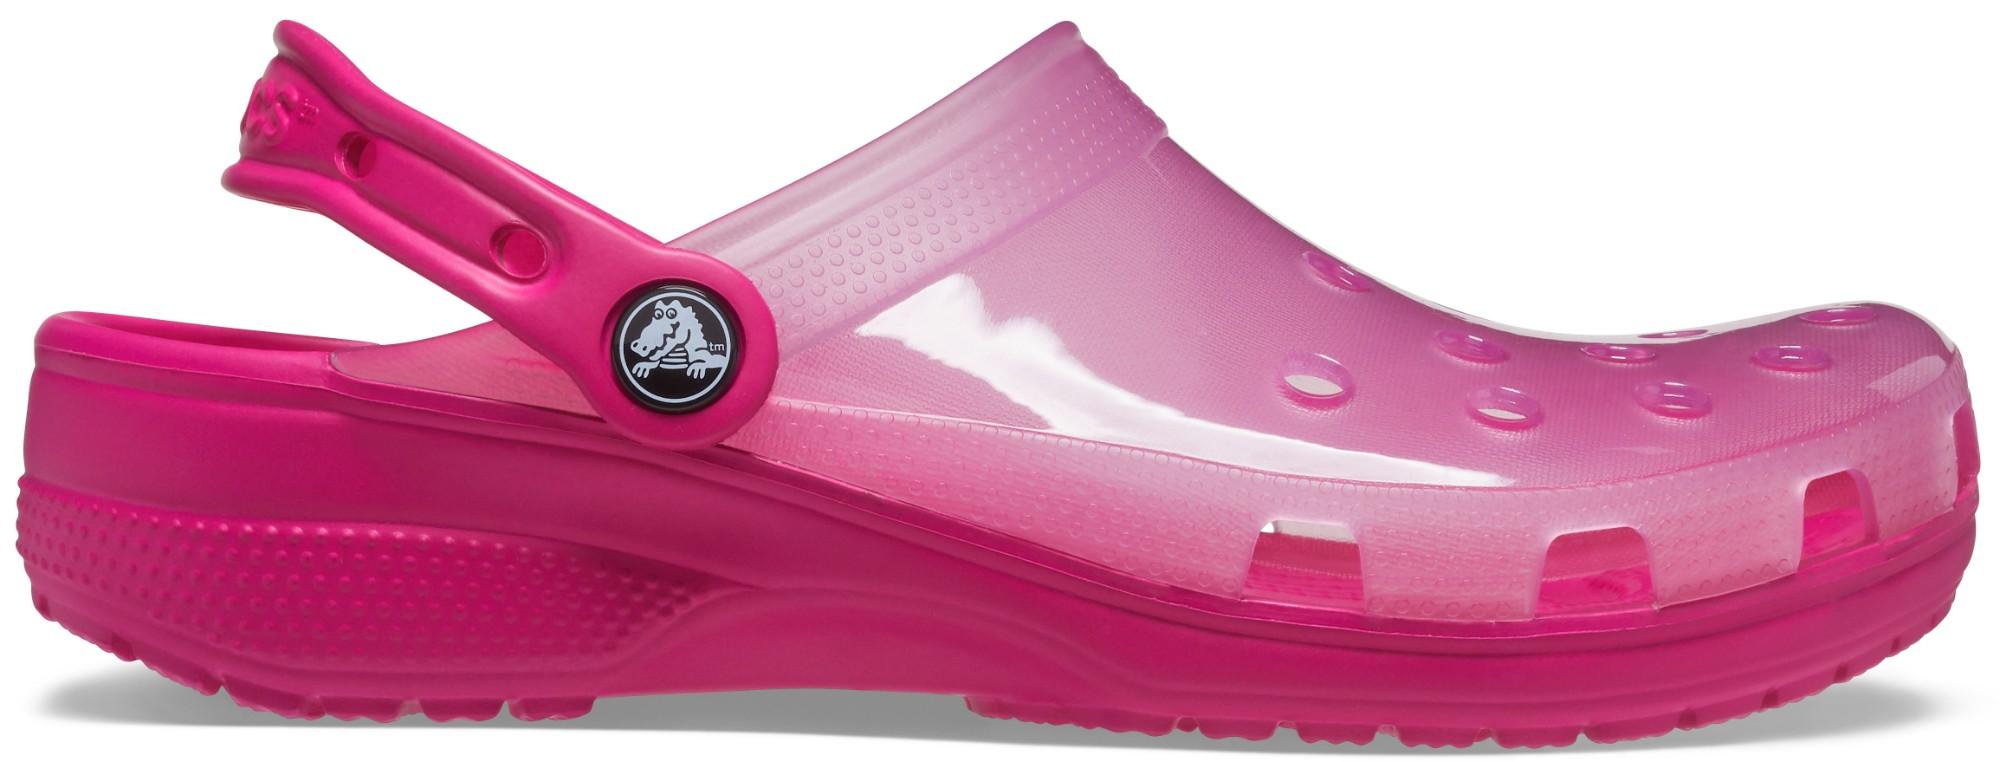 Crocs™ Classic Translucent Clog Candy Pink 39,5